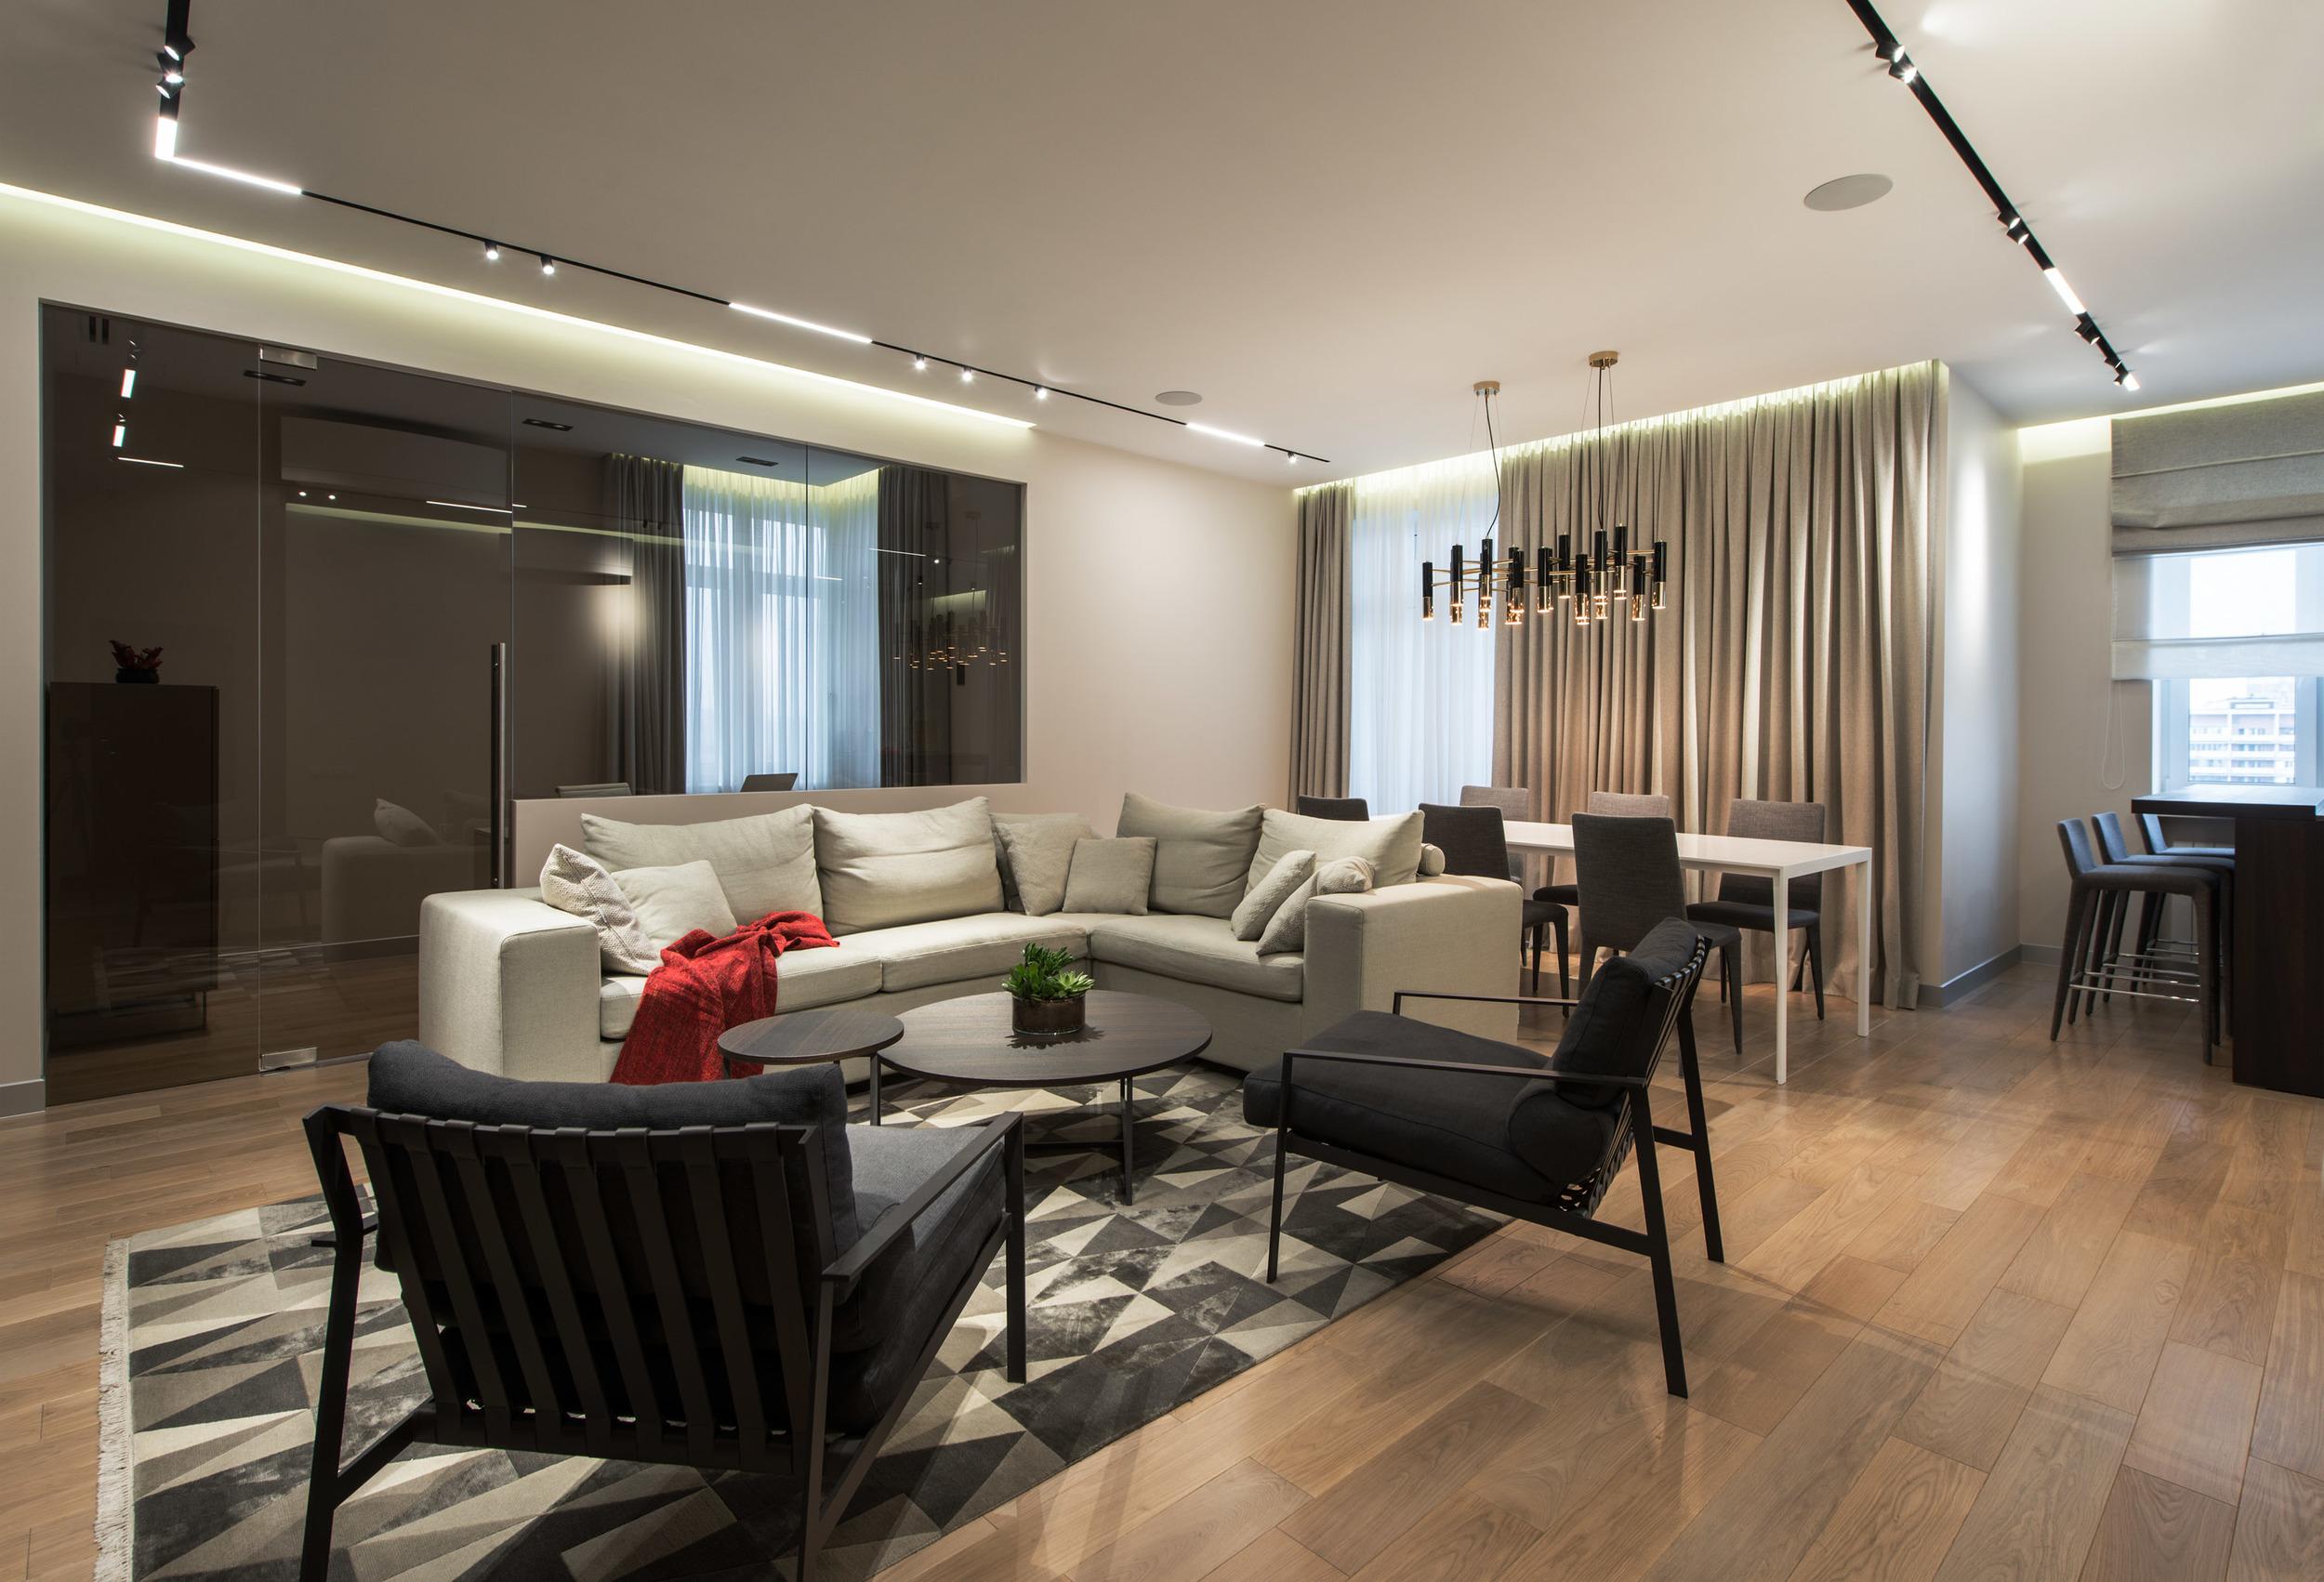 07__Match Architects_living room.jpg